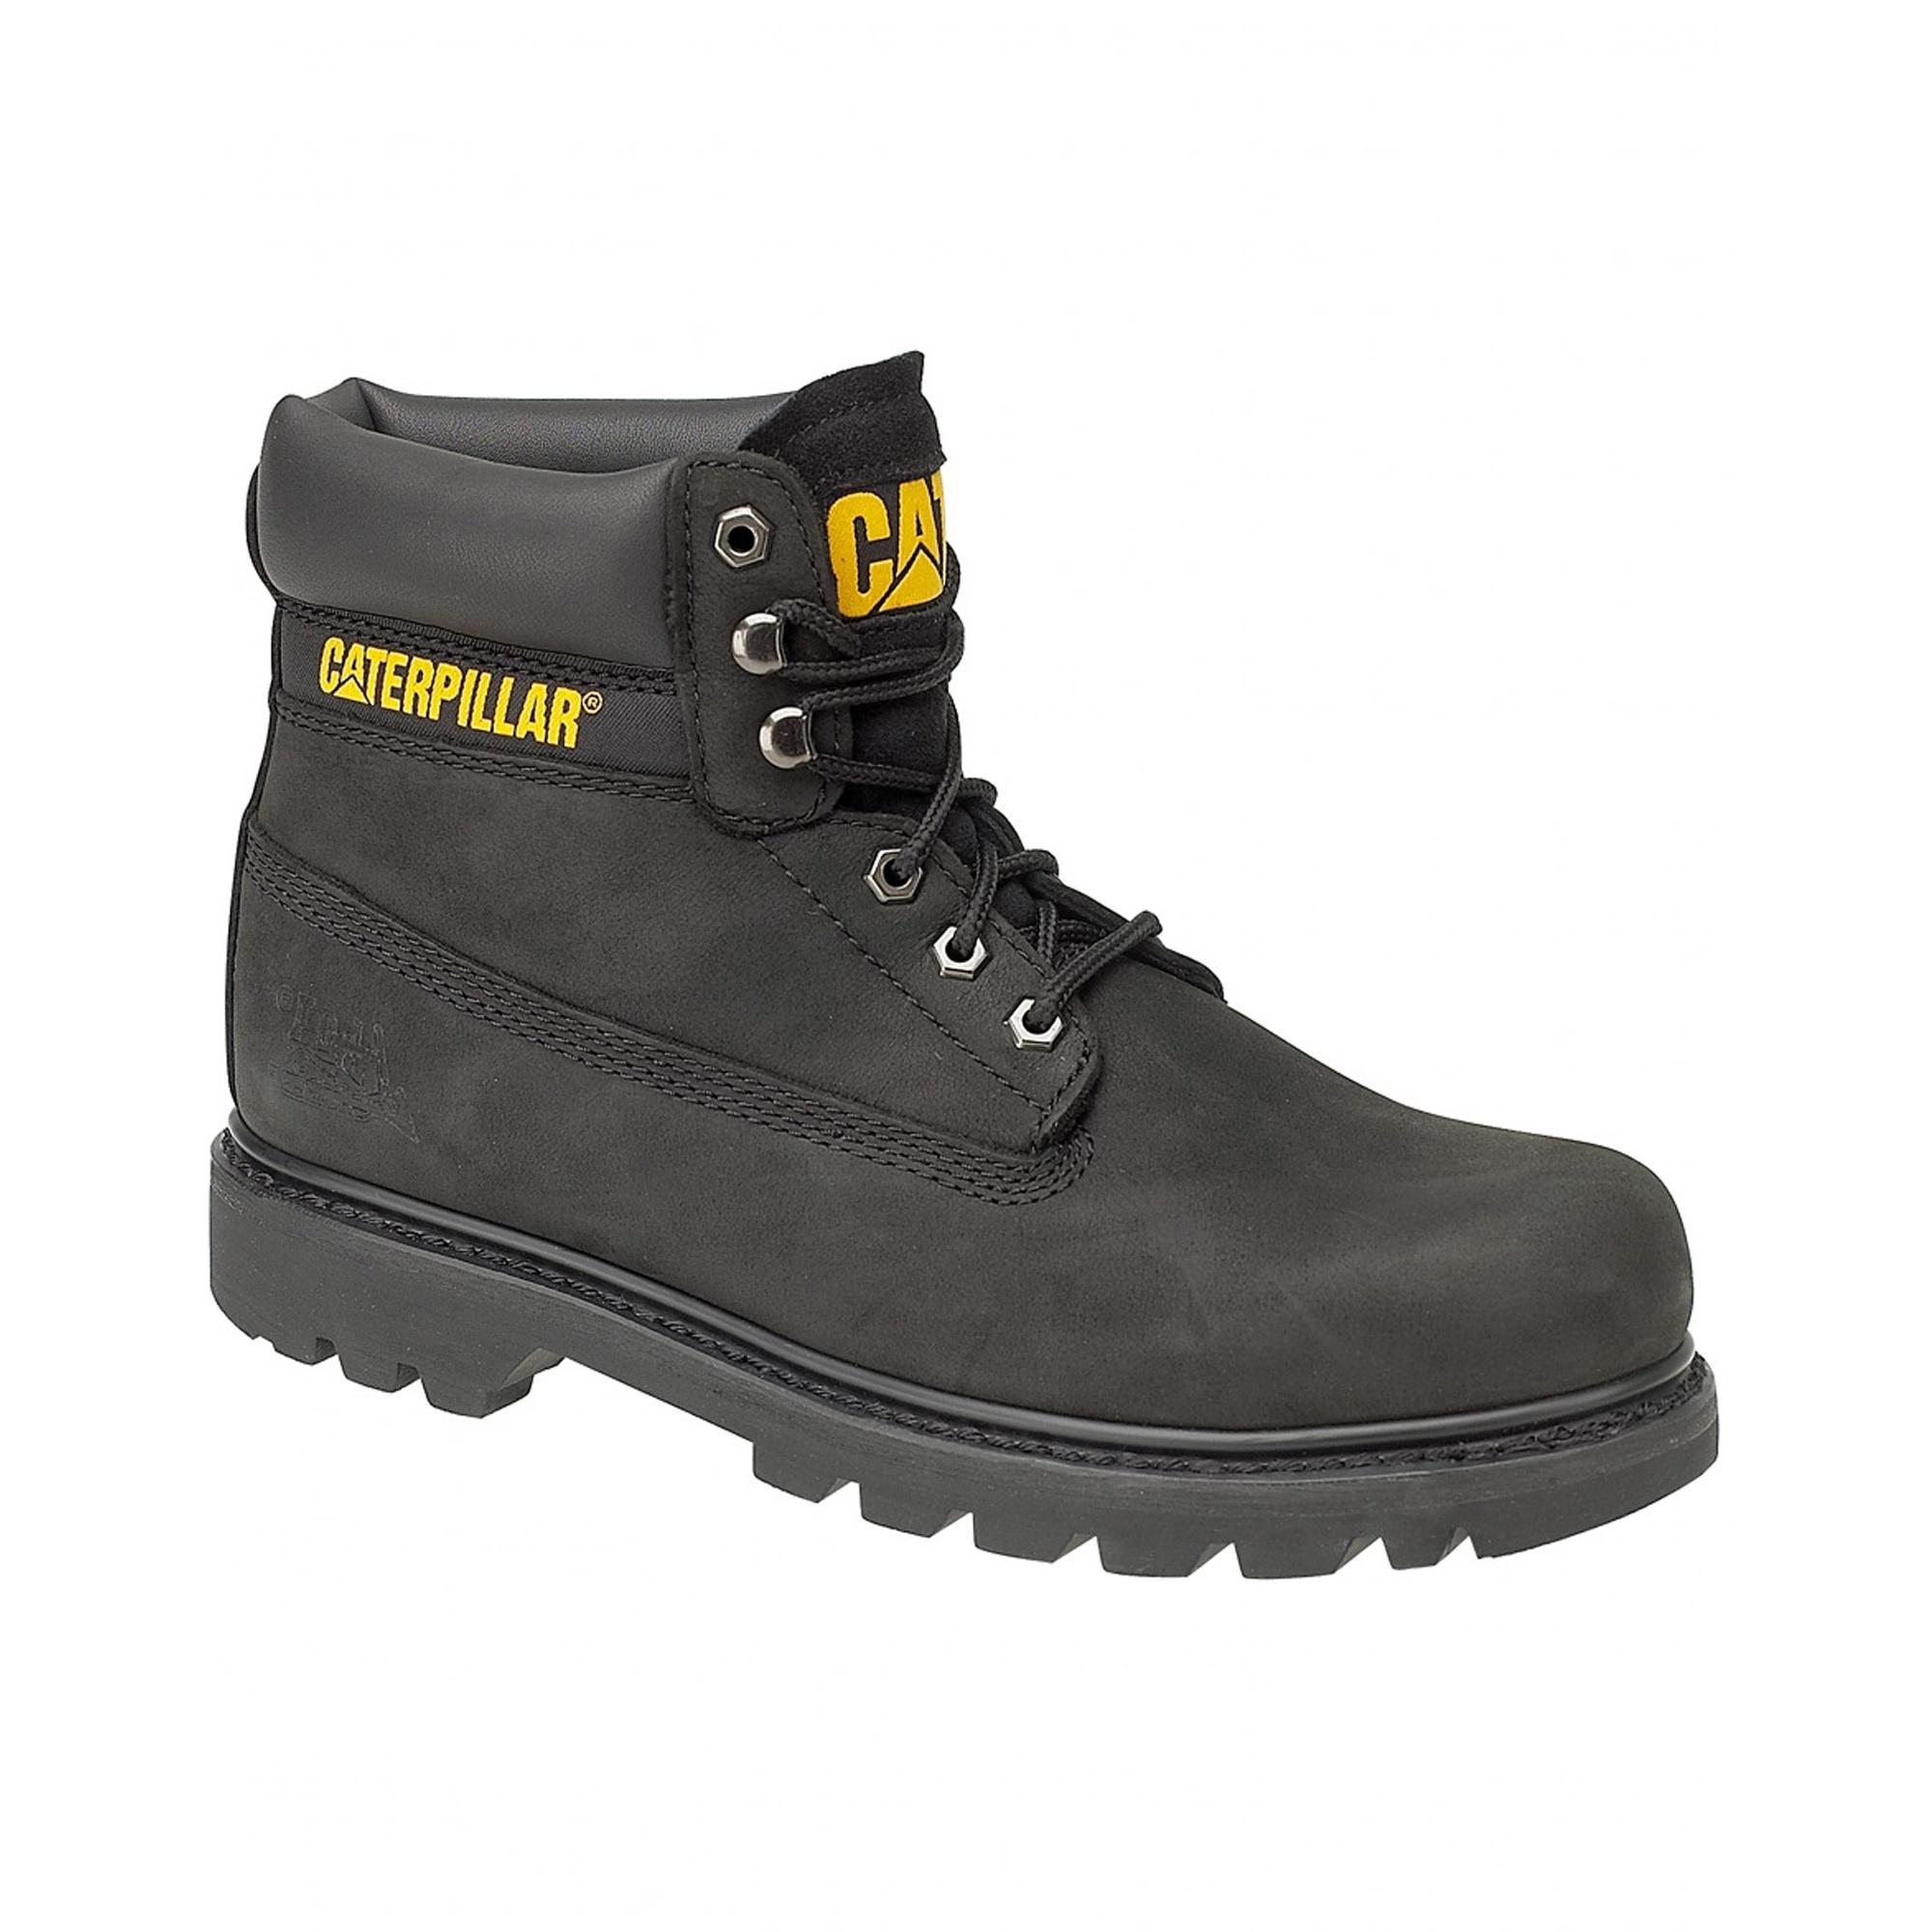 Caterpillar Colorado Lace-Up Boot / Mens Boots / Boots (12 UK) (Black/Nubuck)